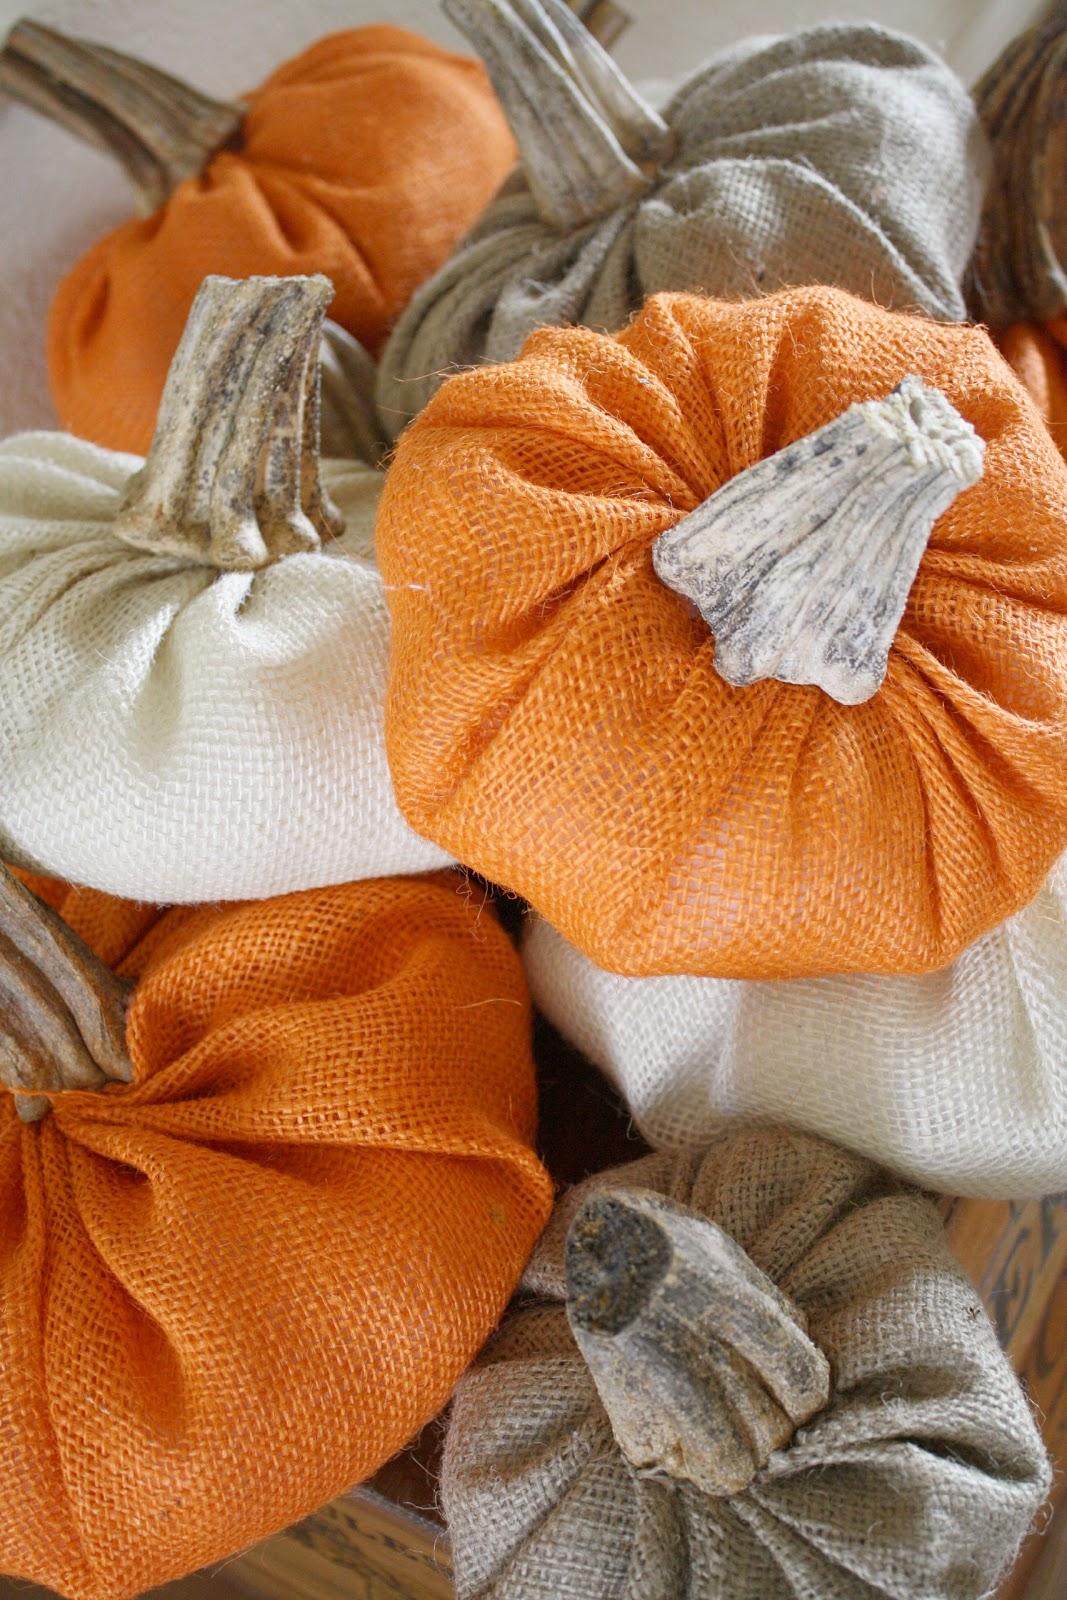 Diy burlap pumpkins with real stems for Burlap crafts